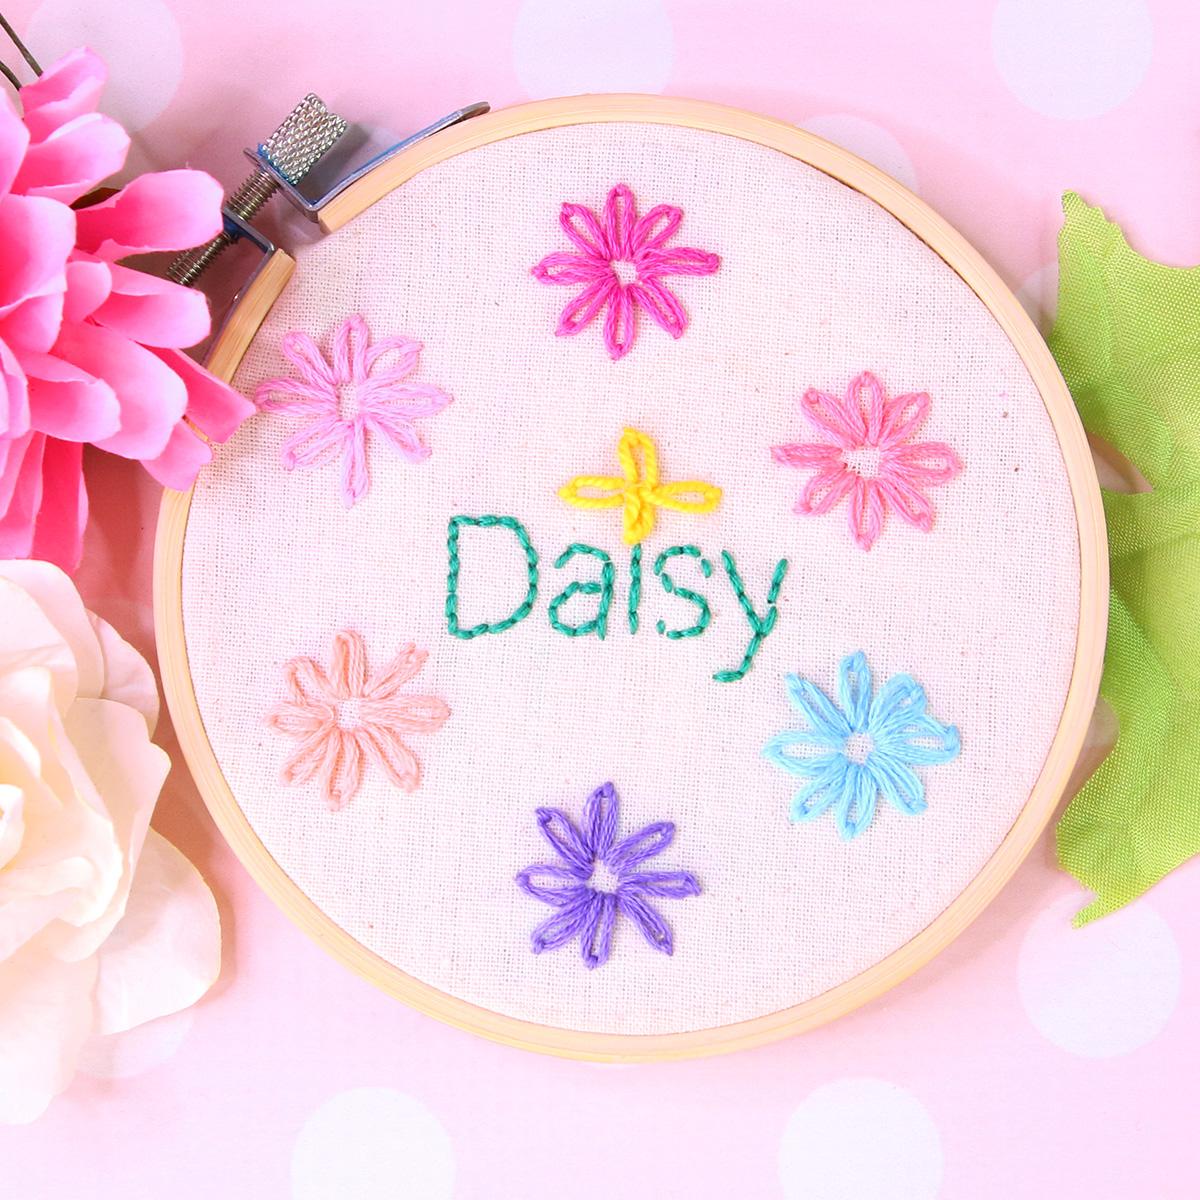 lazy daisy embroidery stitch